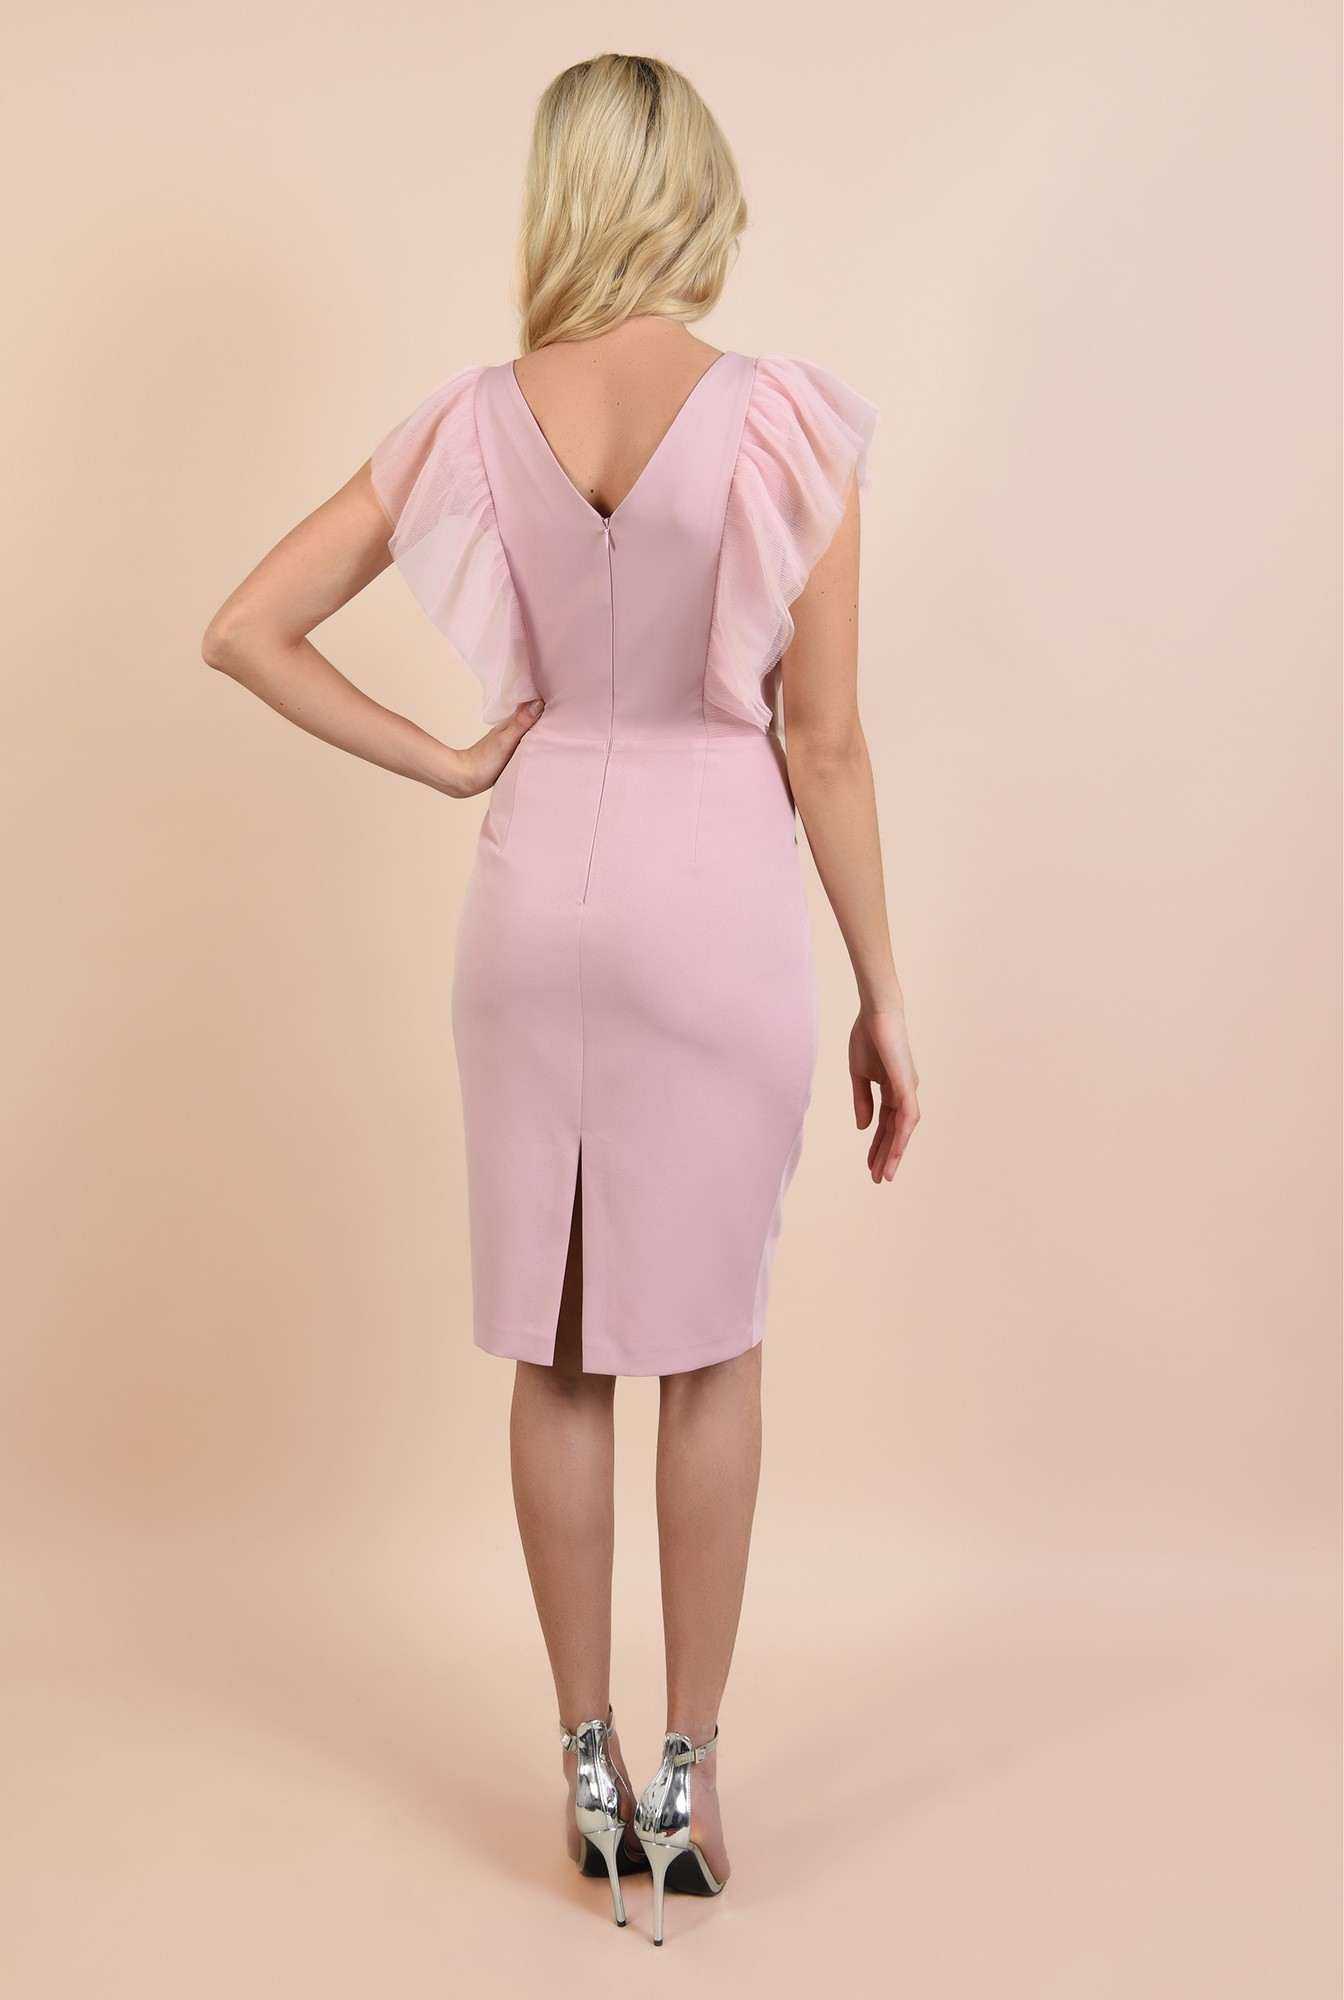 1 - rochie de seara, roz, bodycon, anchior, cusatura in talie, Poema